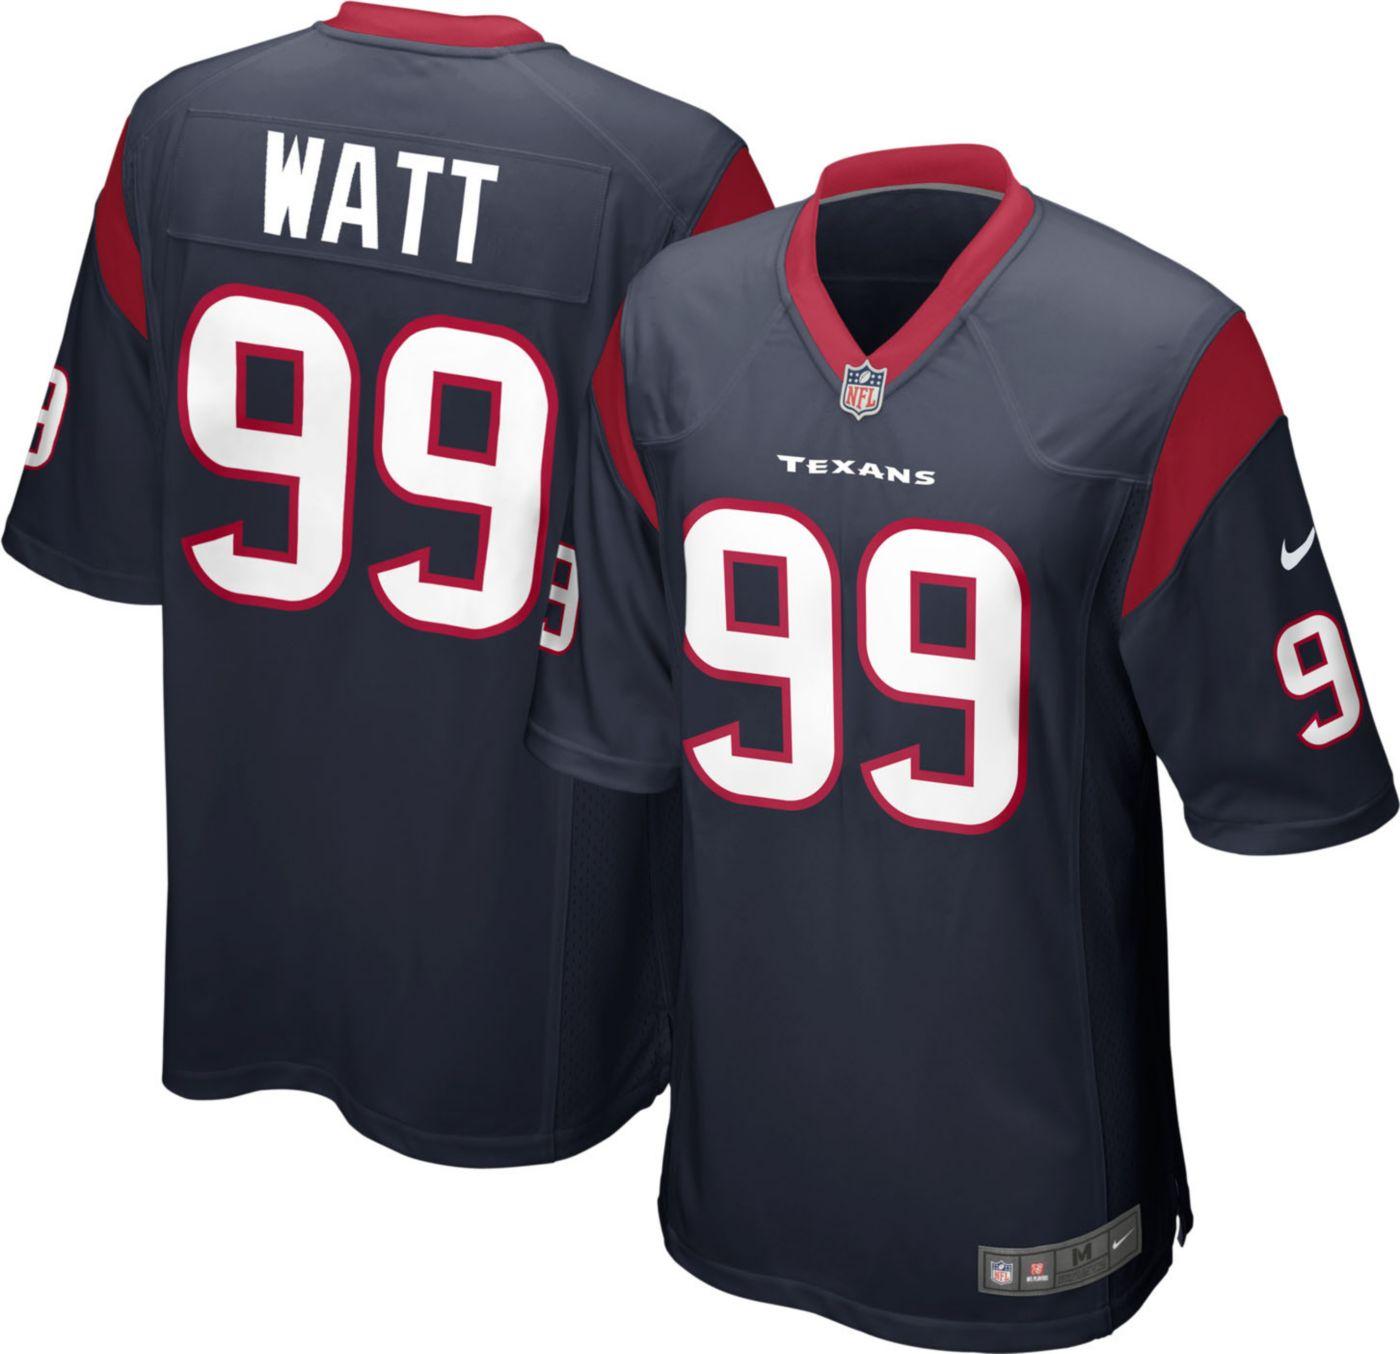 Nike Youth Home Game Jersey Houston Texans J.J. Watt #99